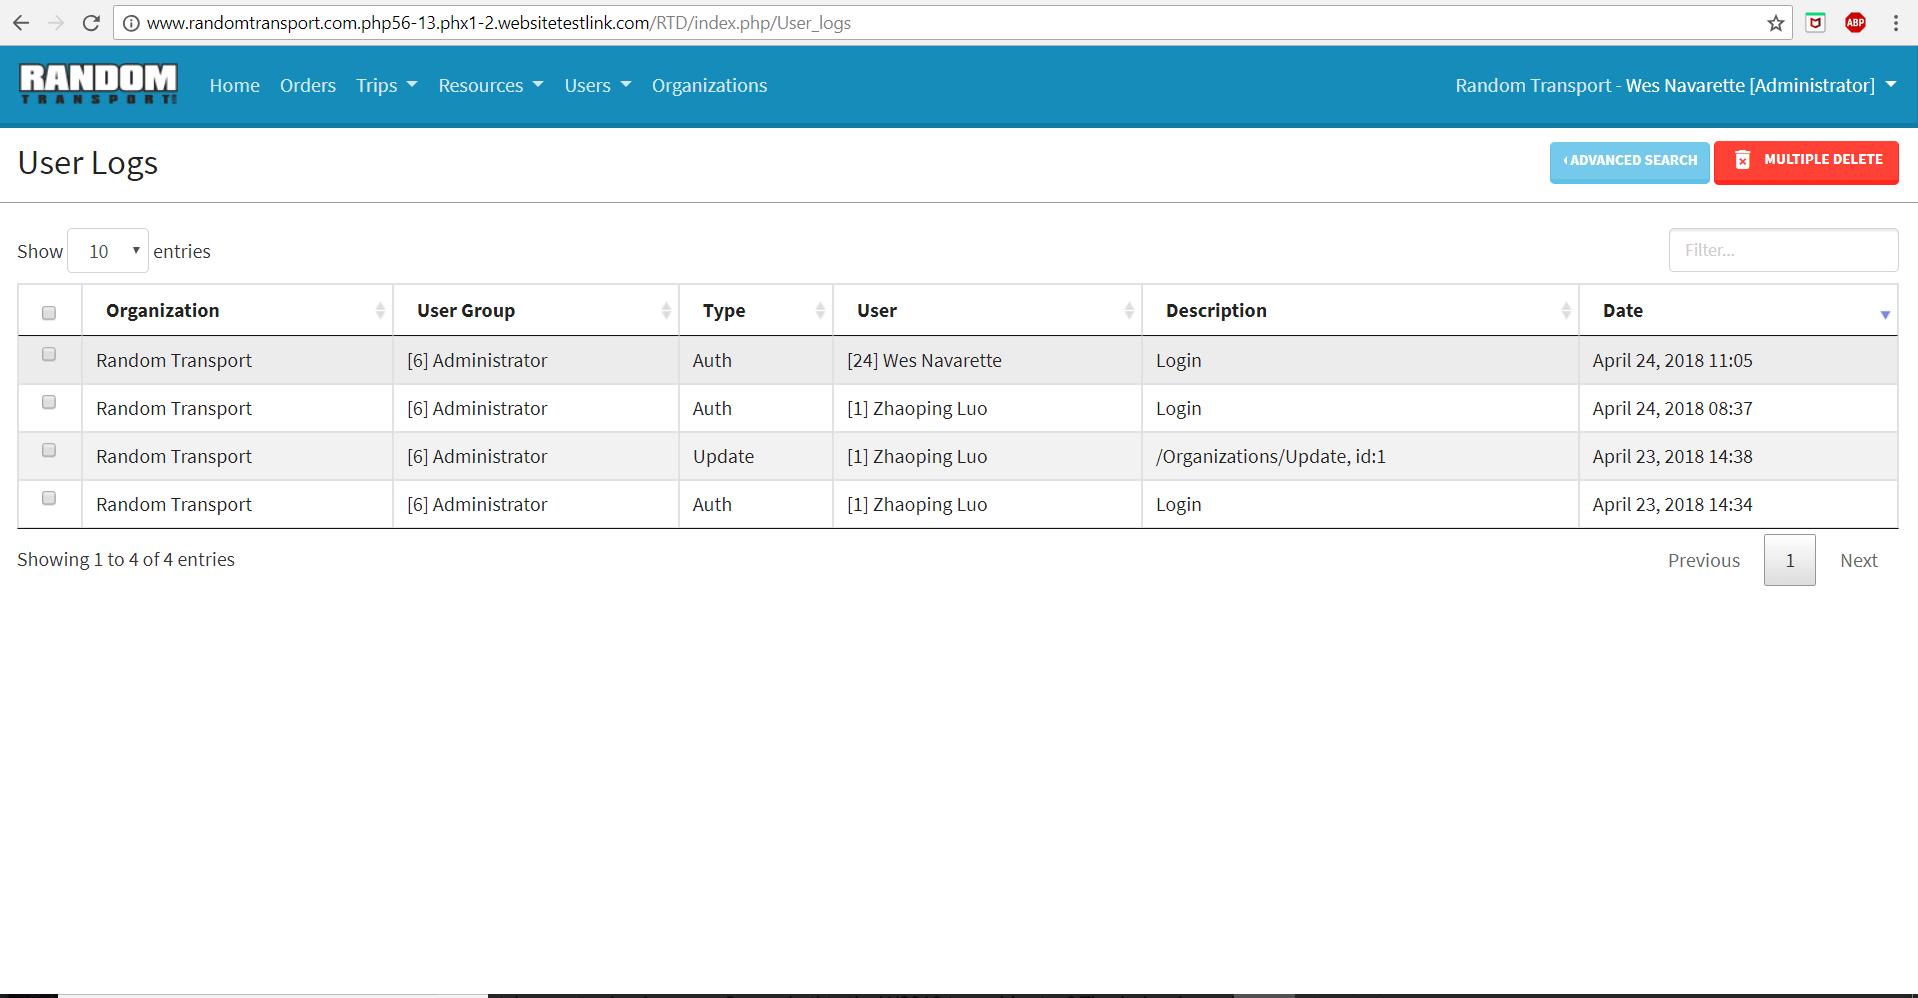 Random Transport - User Logs Screen